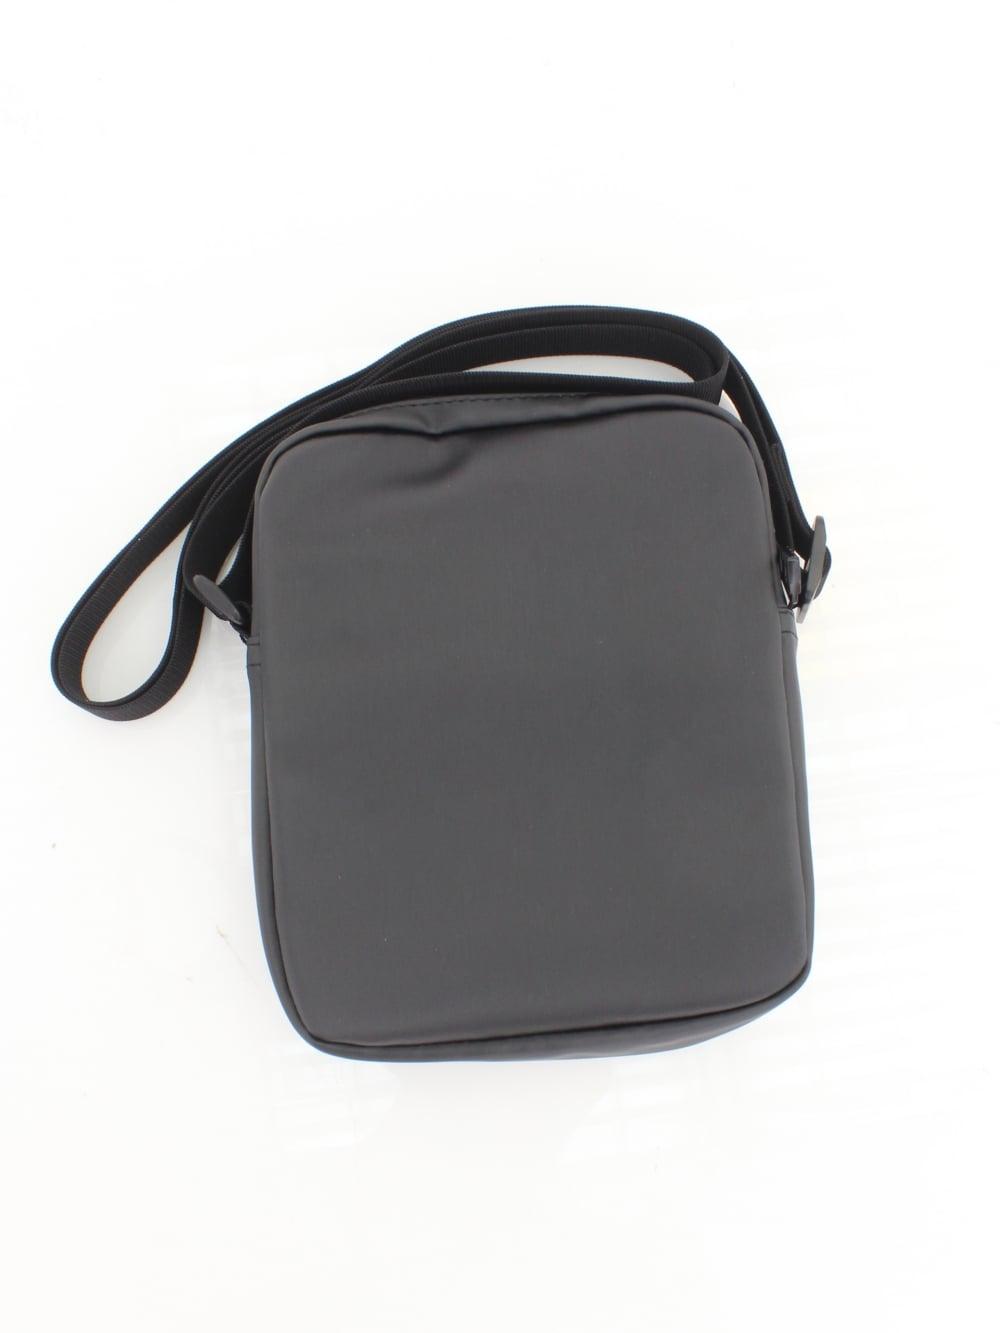 4bdcb6233c62 EA7 Bag in Black - Northern Threads